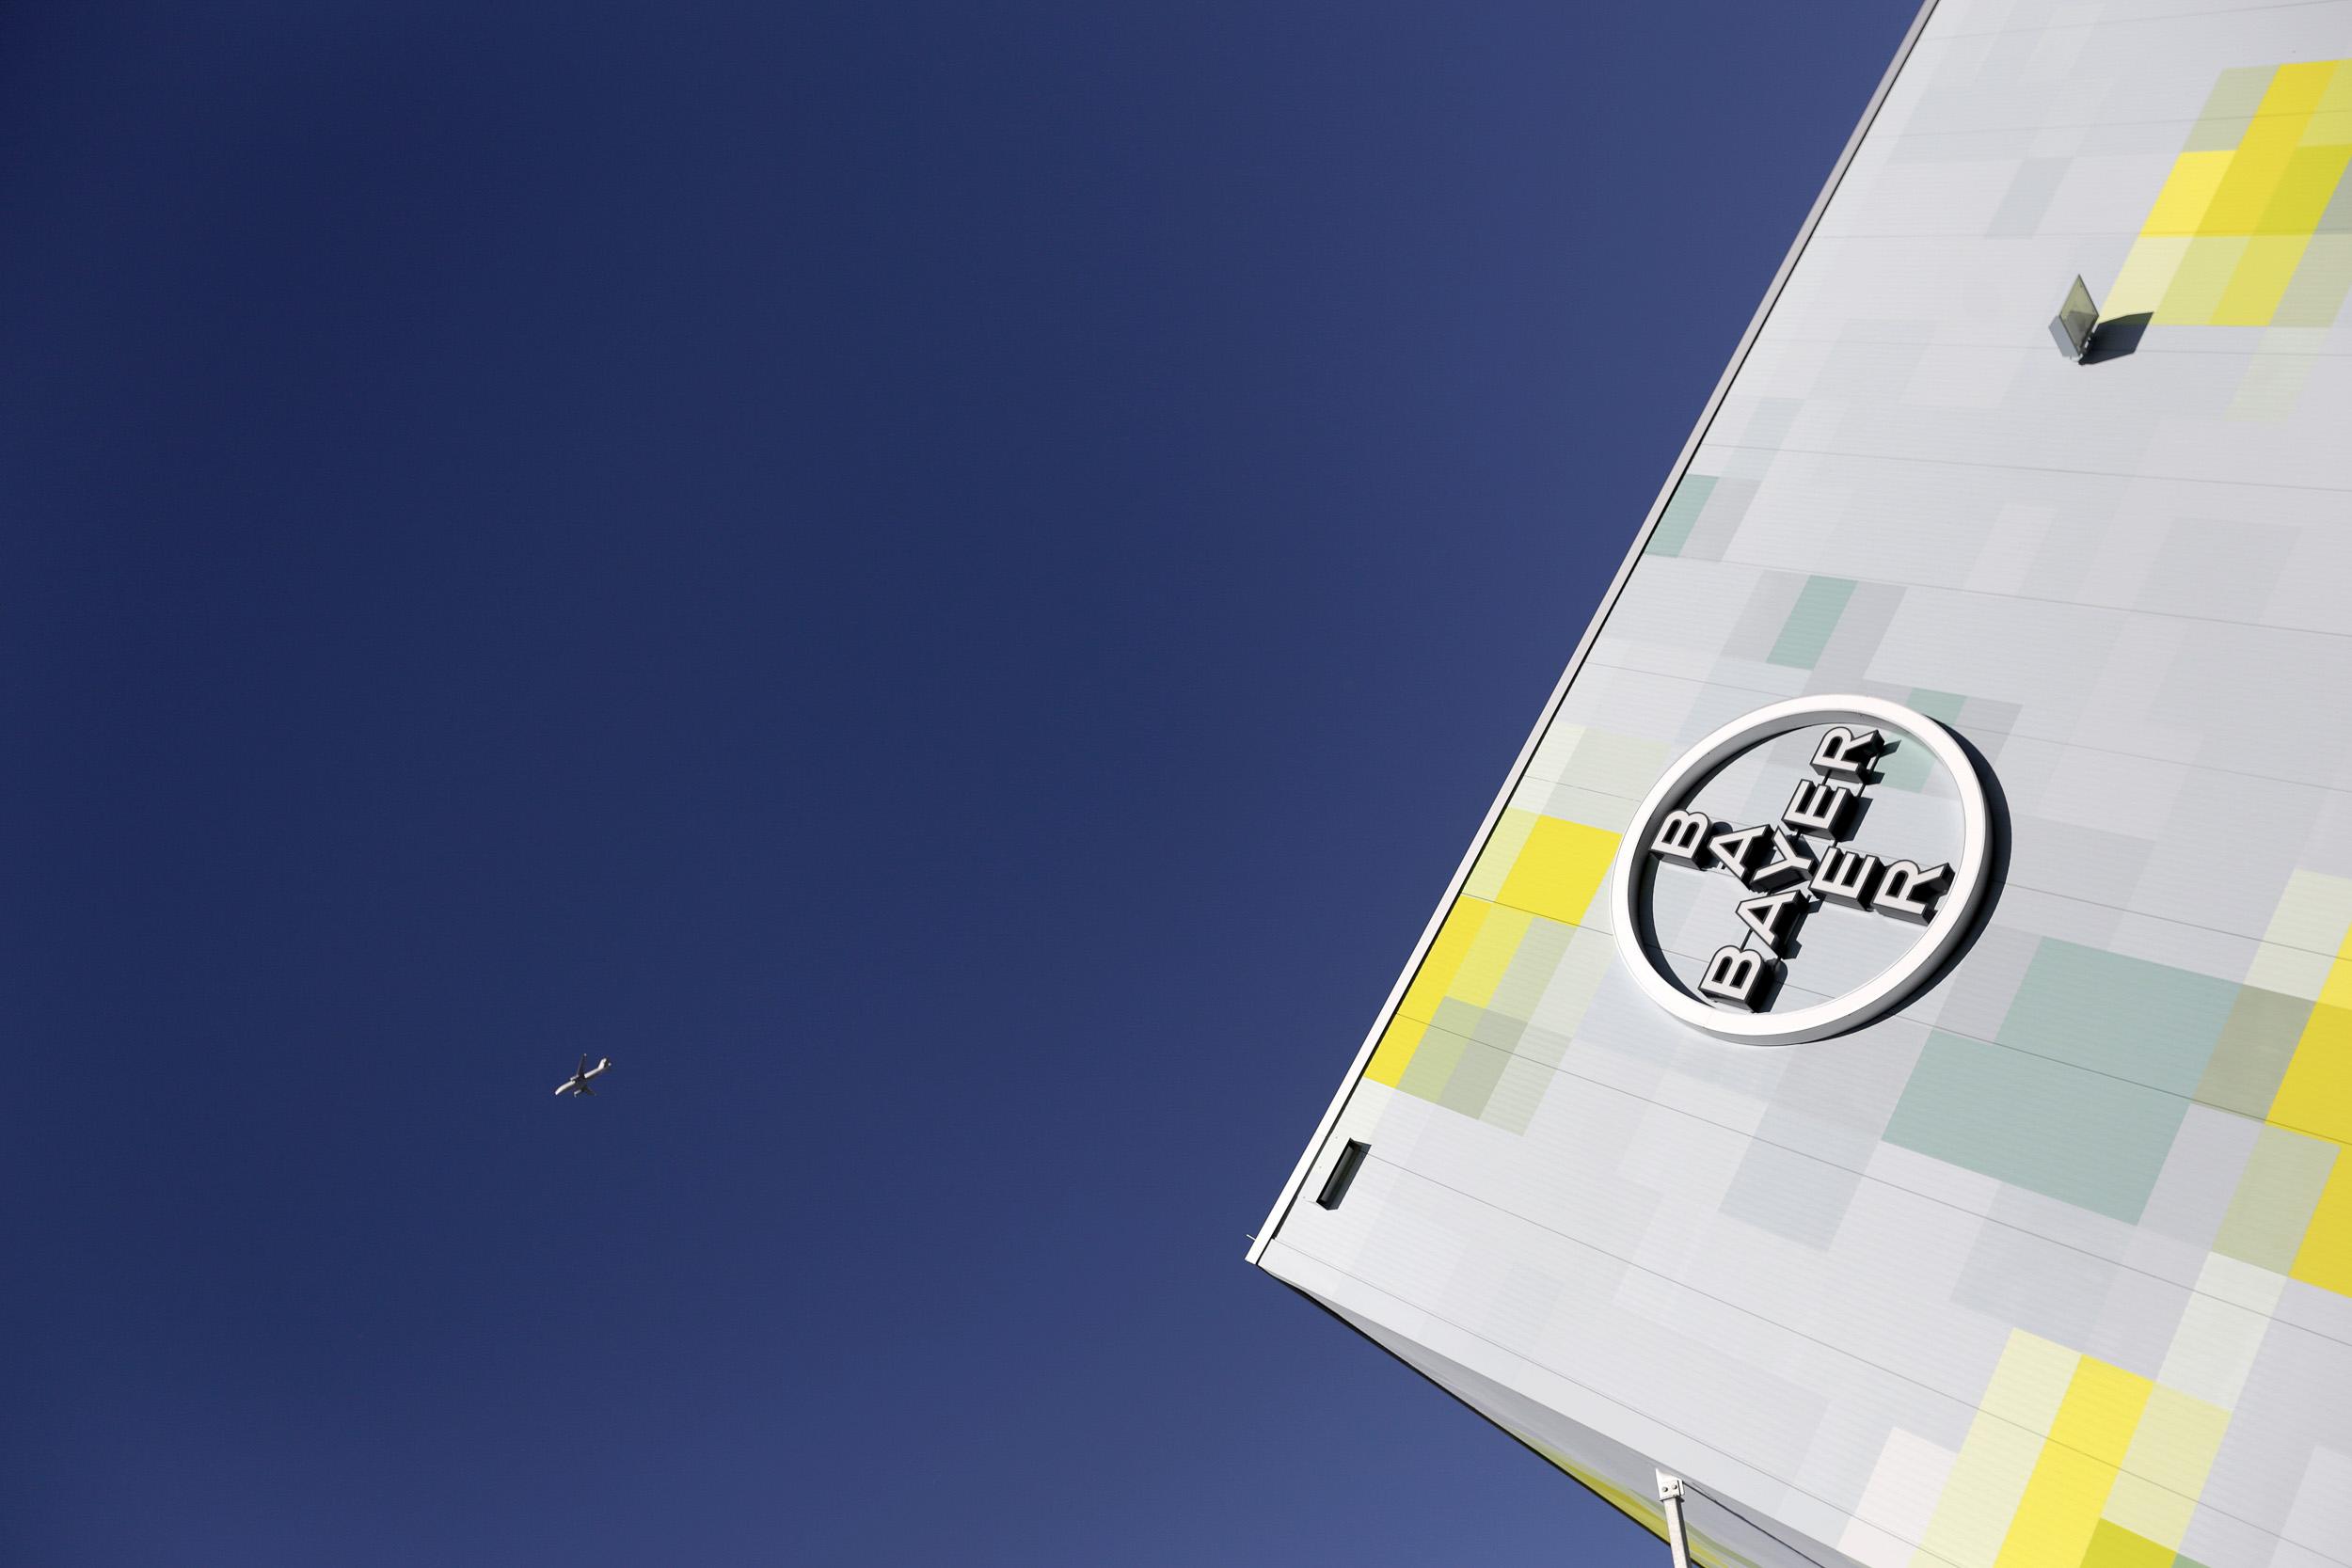 Fassadengestaltung-Industrie-Bayer-Monheim-Logo-Pixel-Art-Lager-Halle-Trapezblech-Metall.jpg